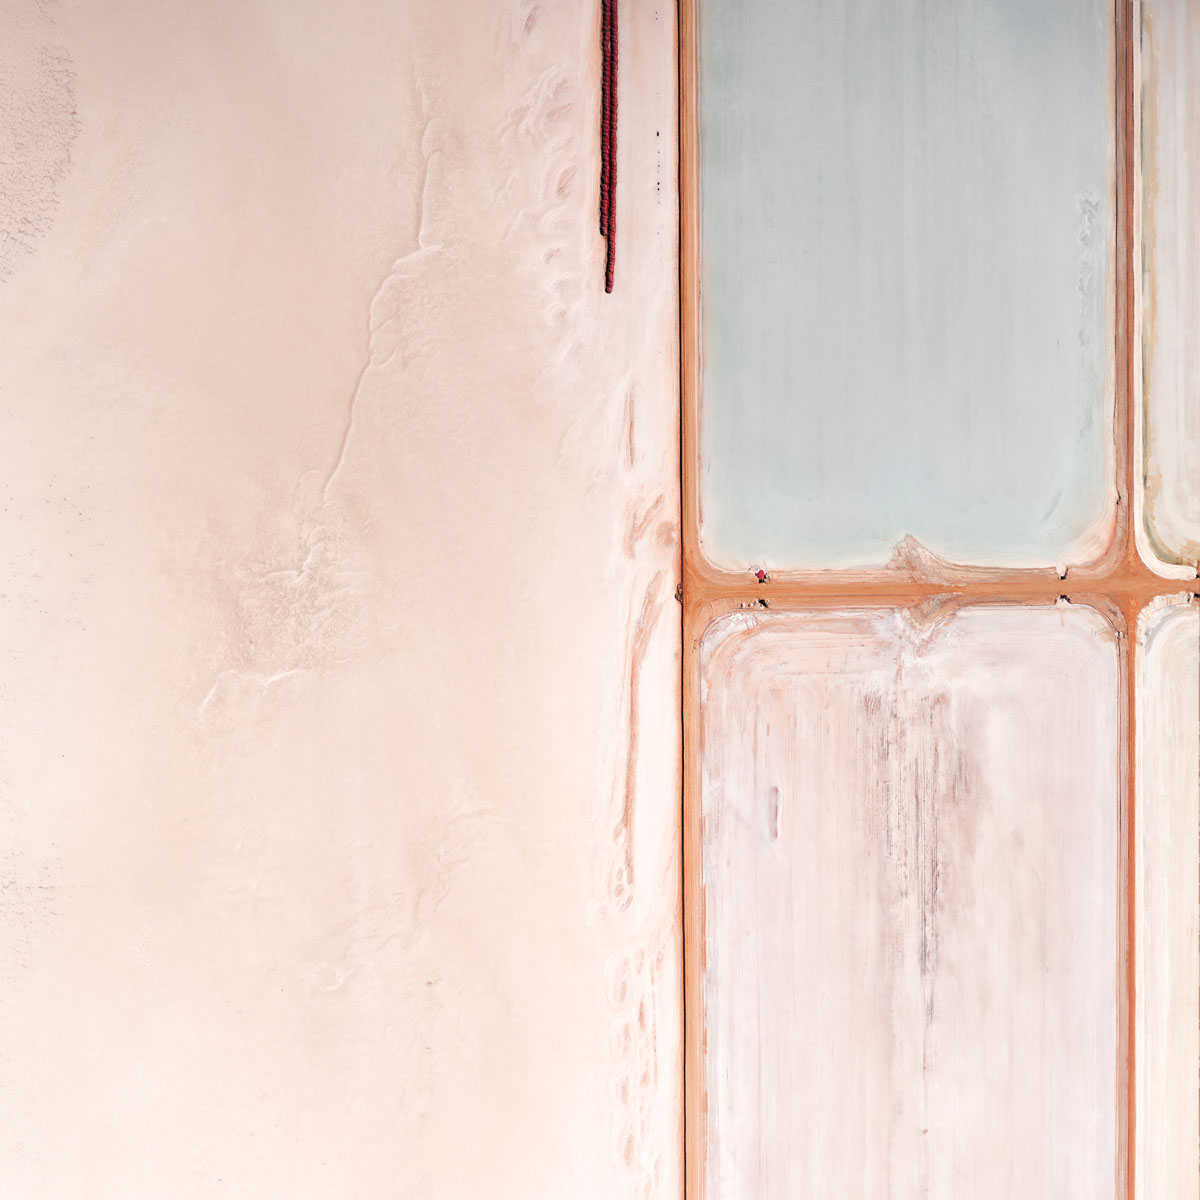 Chris Saunders - 'Aerial Salt 019'